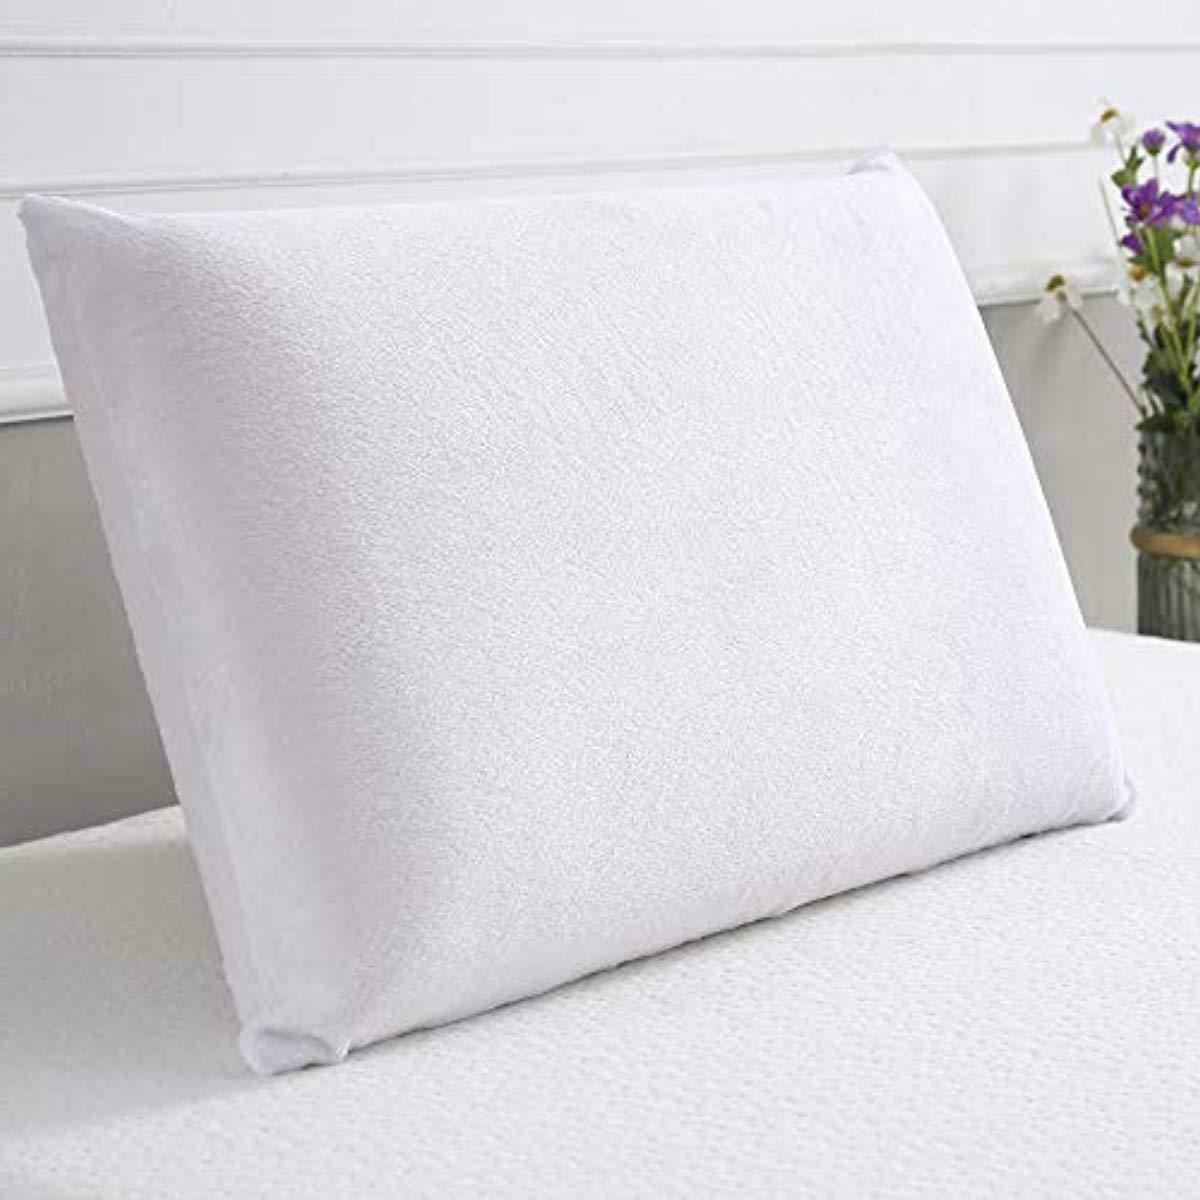 Classic Conforma Ventilated Memory Foam Cushion Pillow, Queen